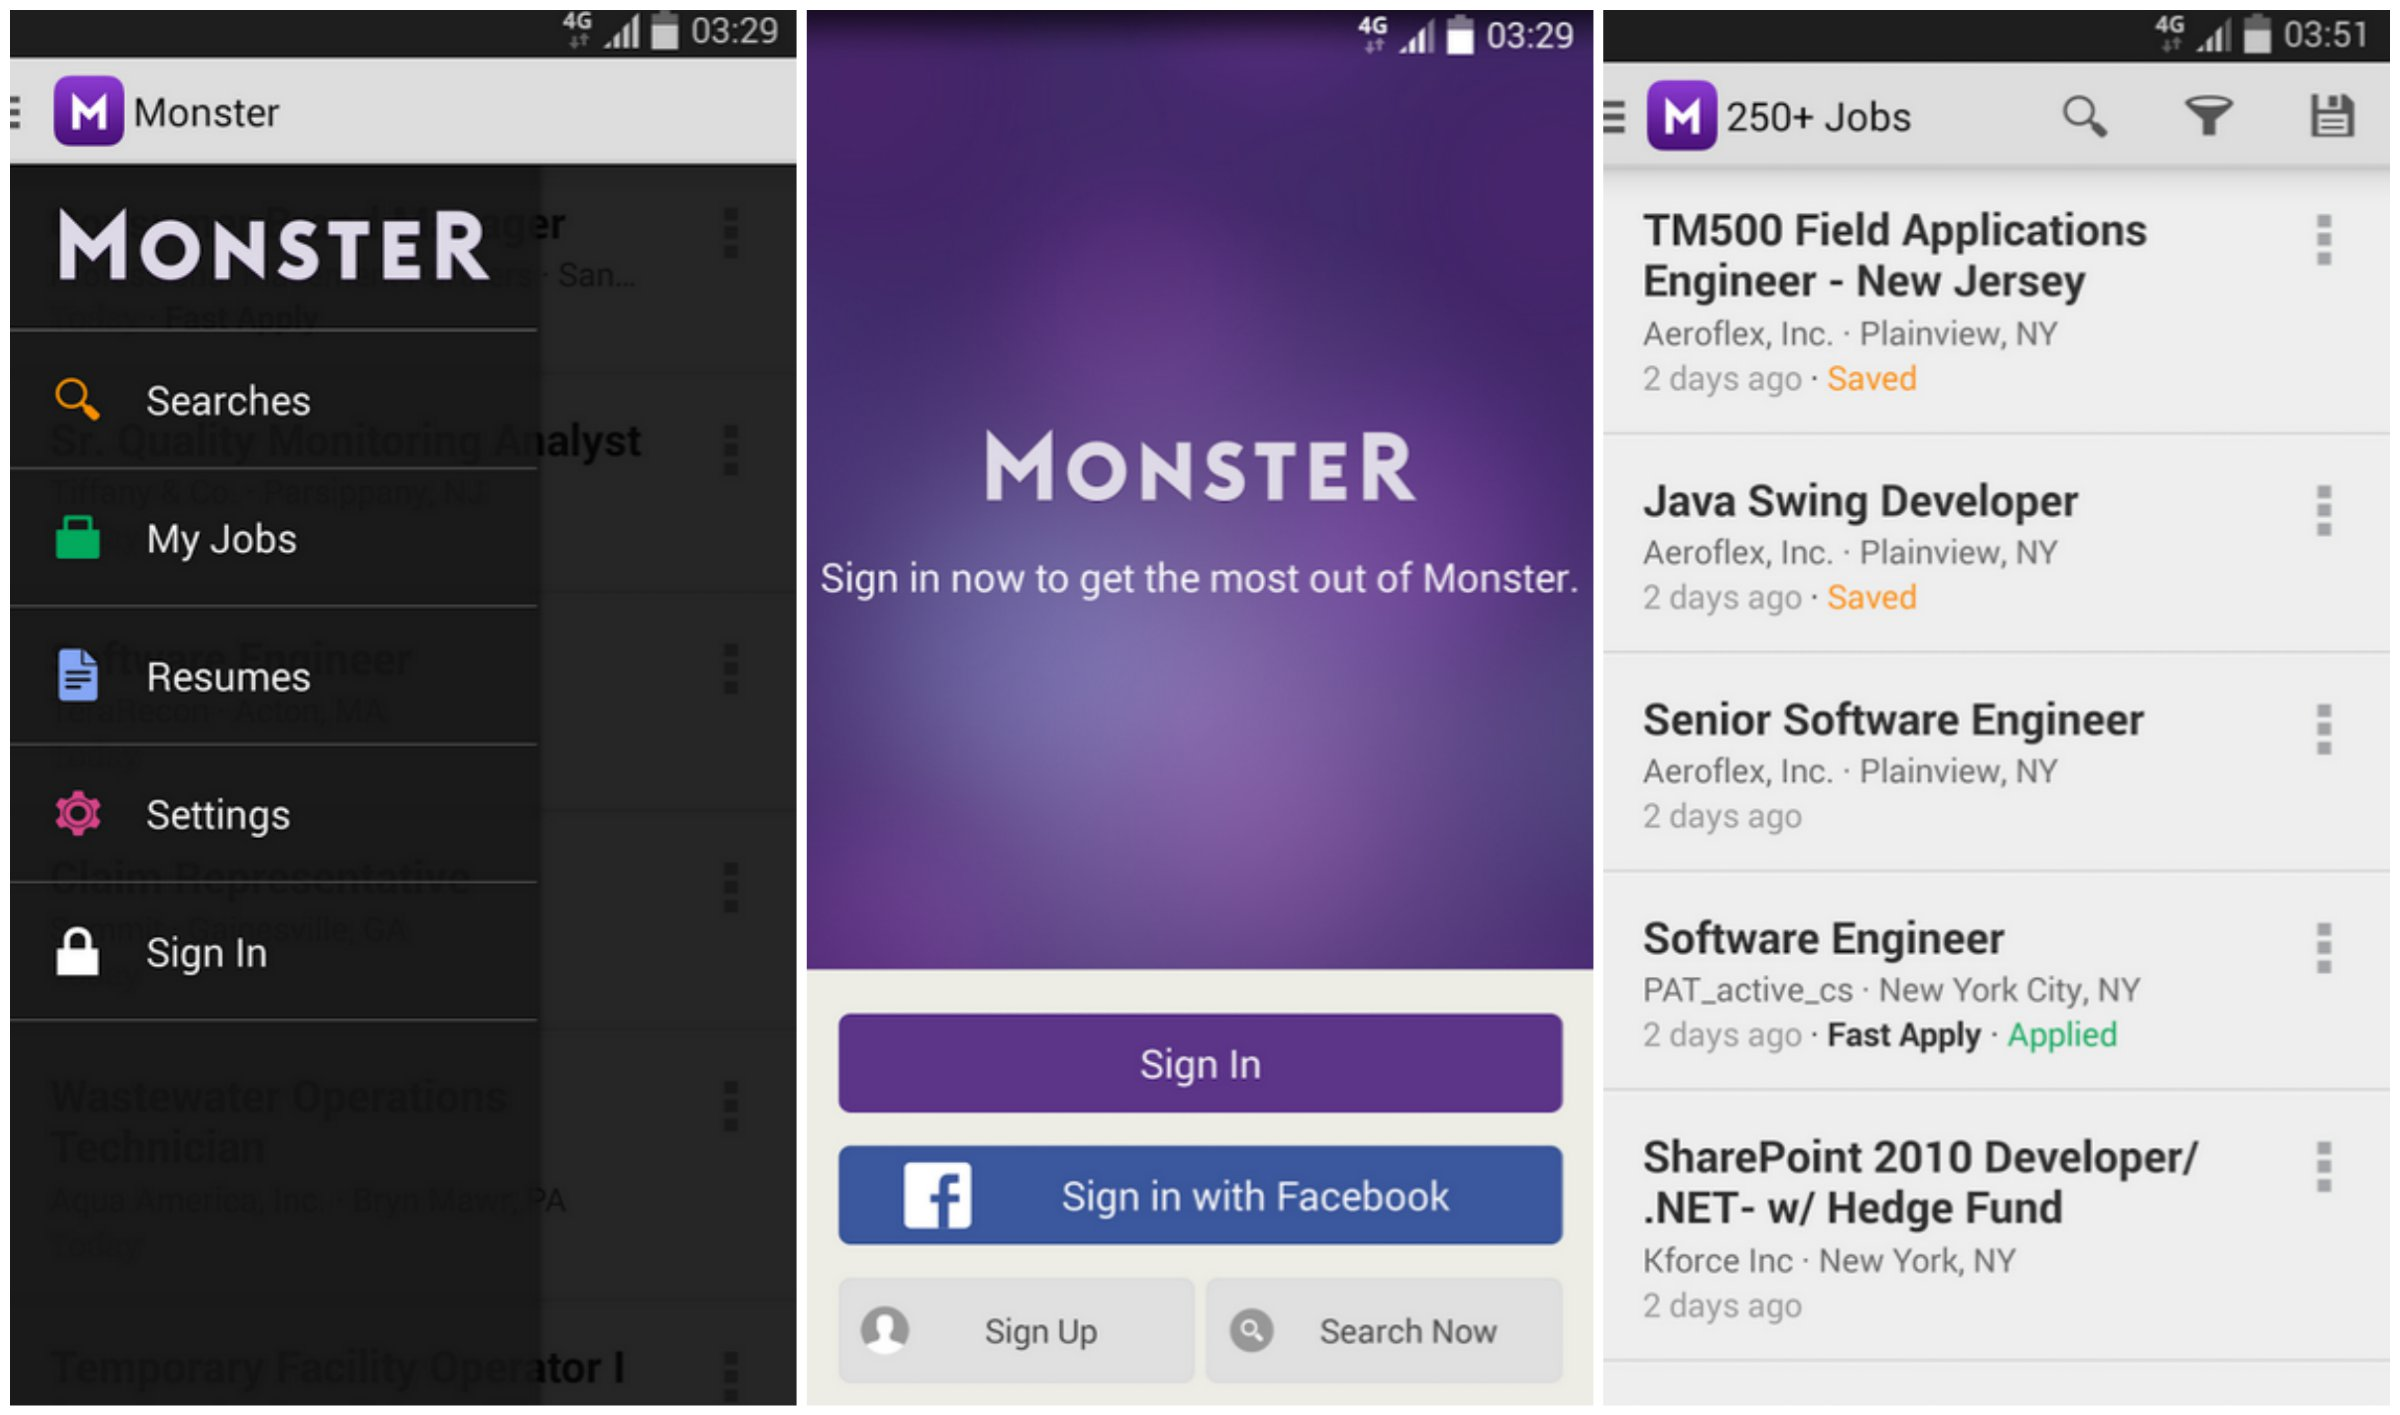 Monster - أفضل تطبيقات البحث عن الوظائف وكتابة السيرة الذاتية للأندرويد والآيفون